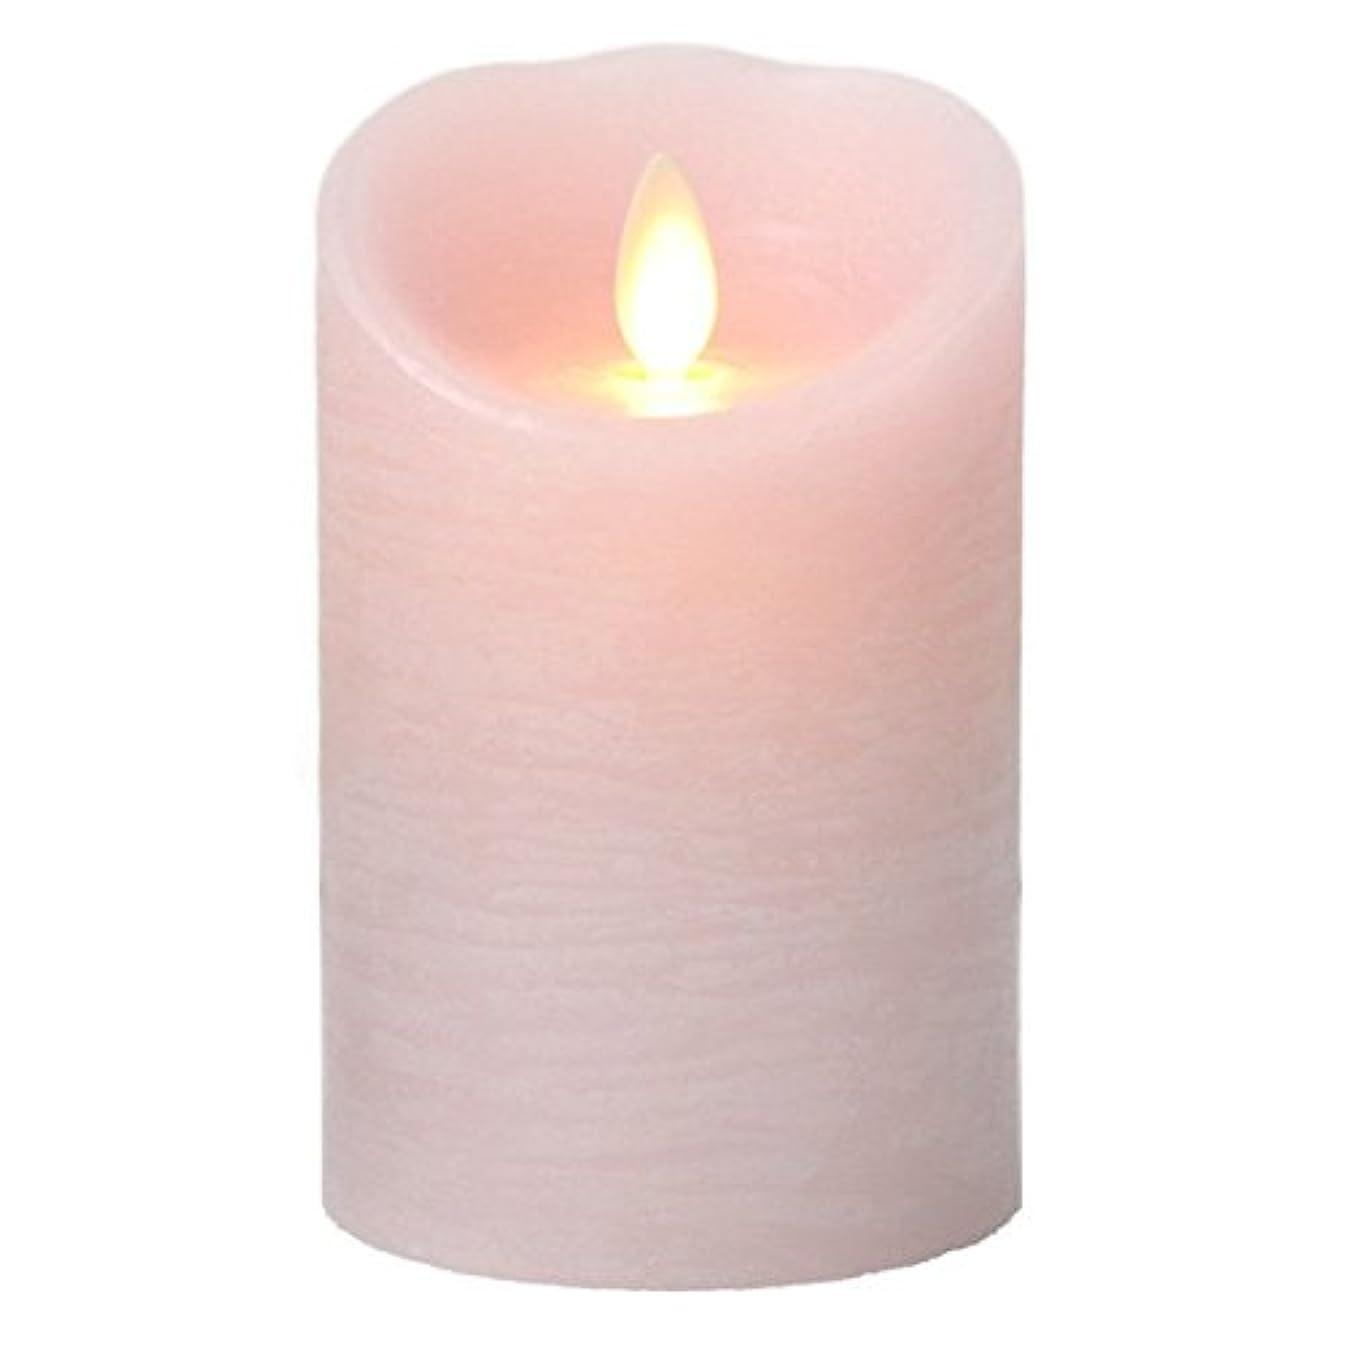 LUMINARA S ピンク LM102-PK 生活用品 インテリア 雑貨 アロマ 芳香剤 消臭剤 その他のアロマ top1-ds-1213214-ah刻印 [簡素パッケージ品]